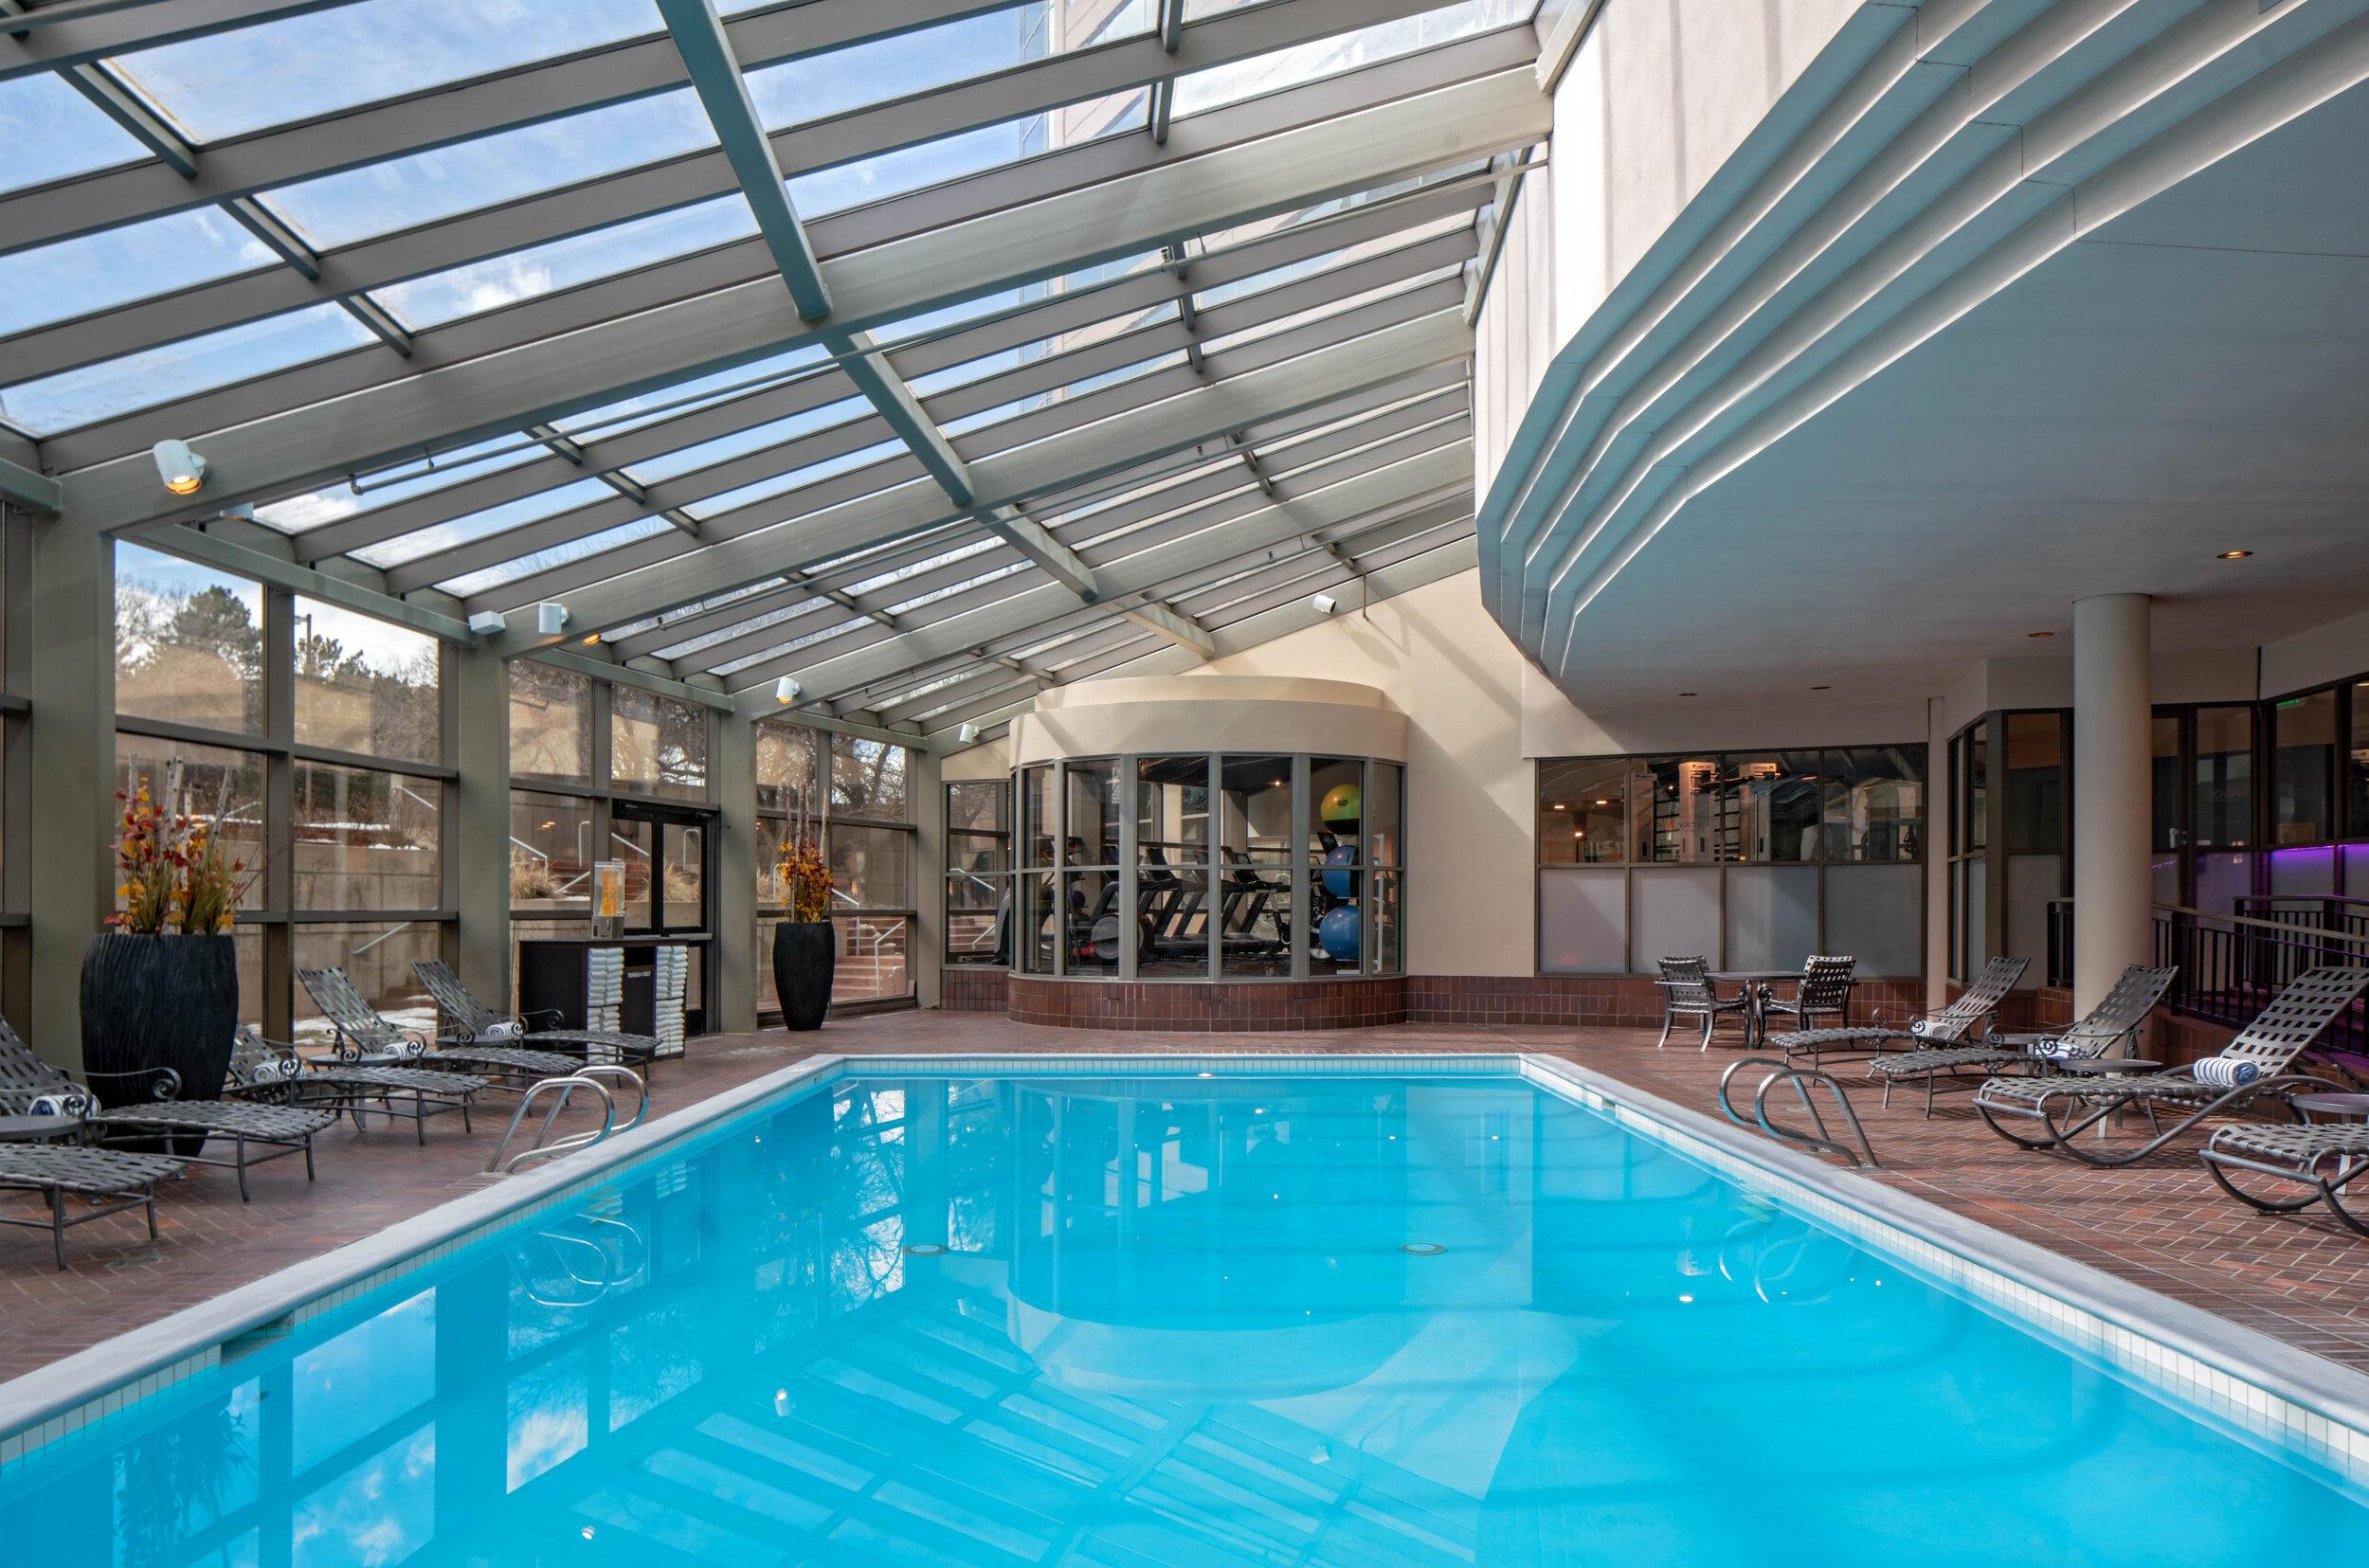 Pool-Fitness-View.jpg